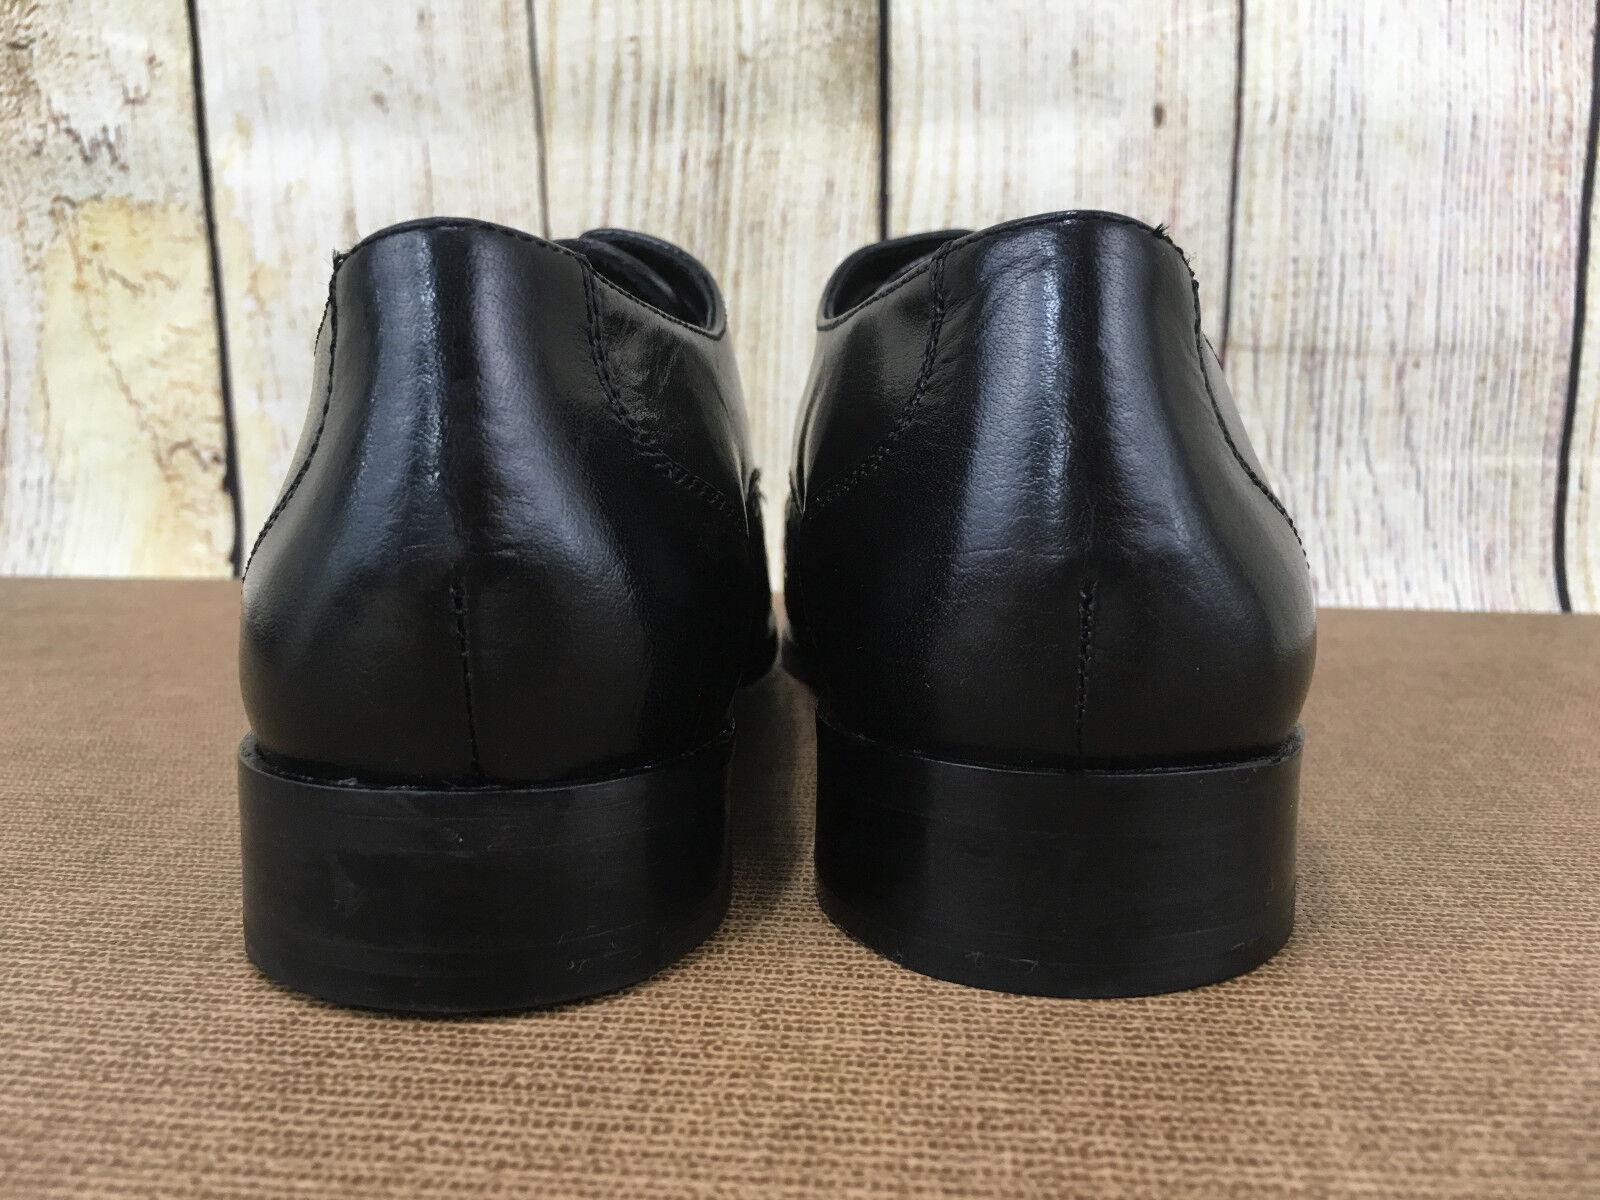 Cole Haan W01024-001 W01024-001 W01024-001 Wmns Jagger Weave Oxford Black  Mismatch Size 7 & 8.5 V57(6 f18600